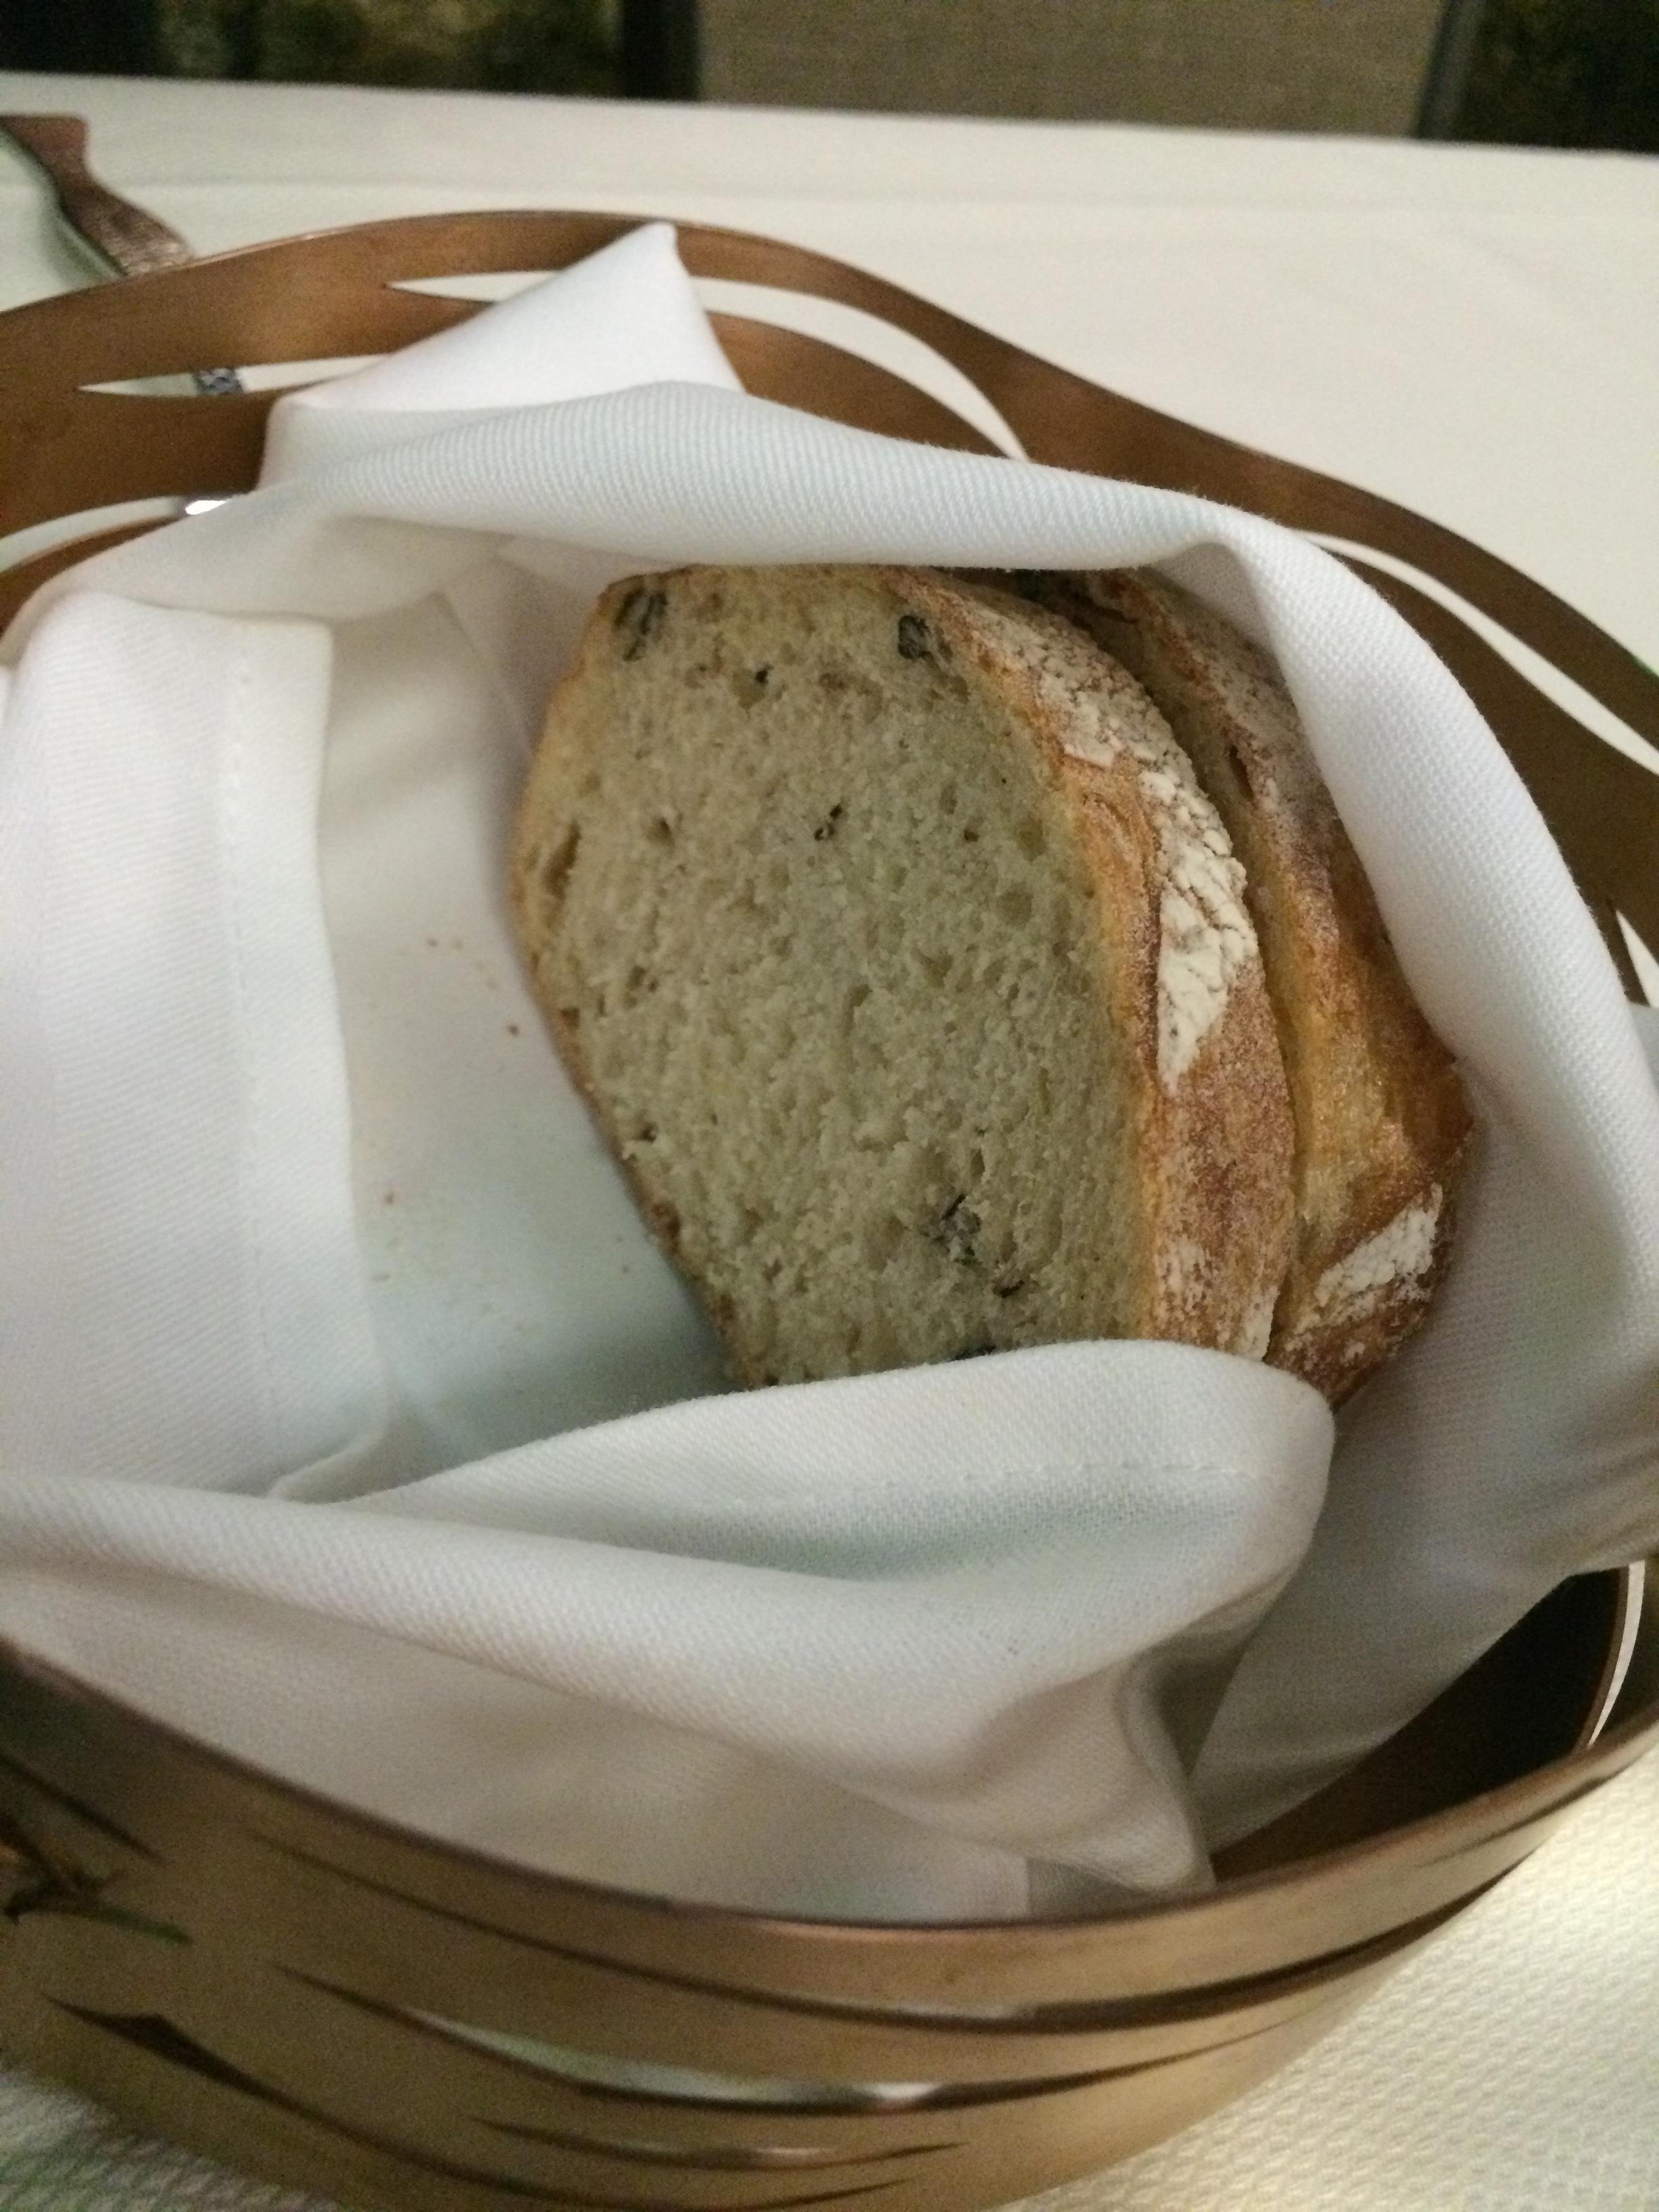 Seaweed-flecked bread!